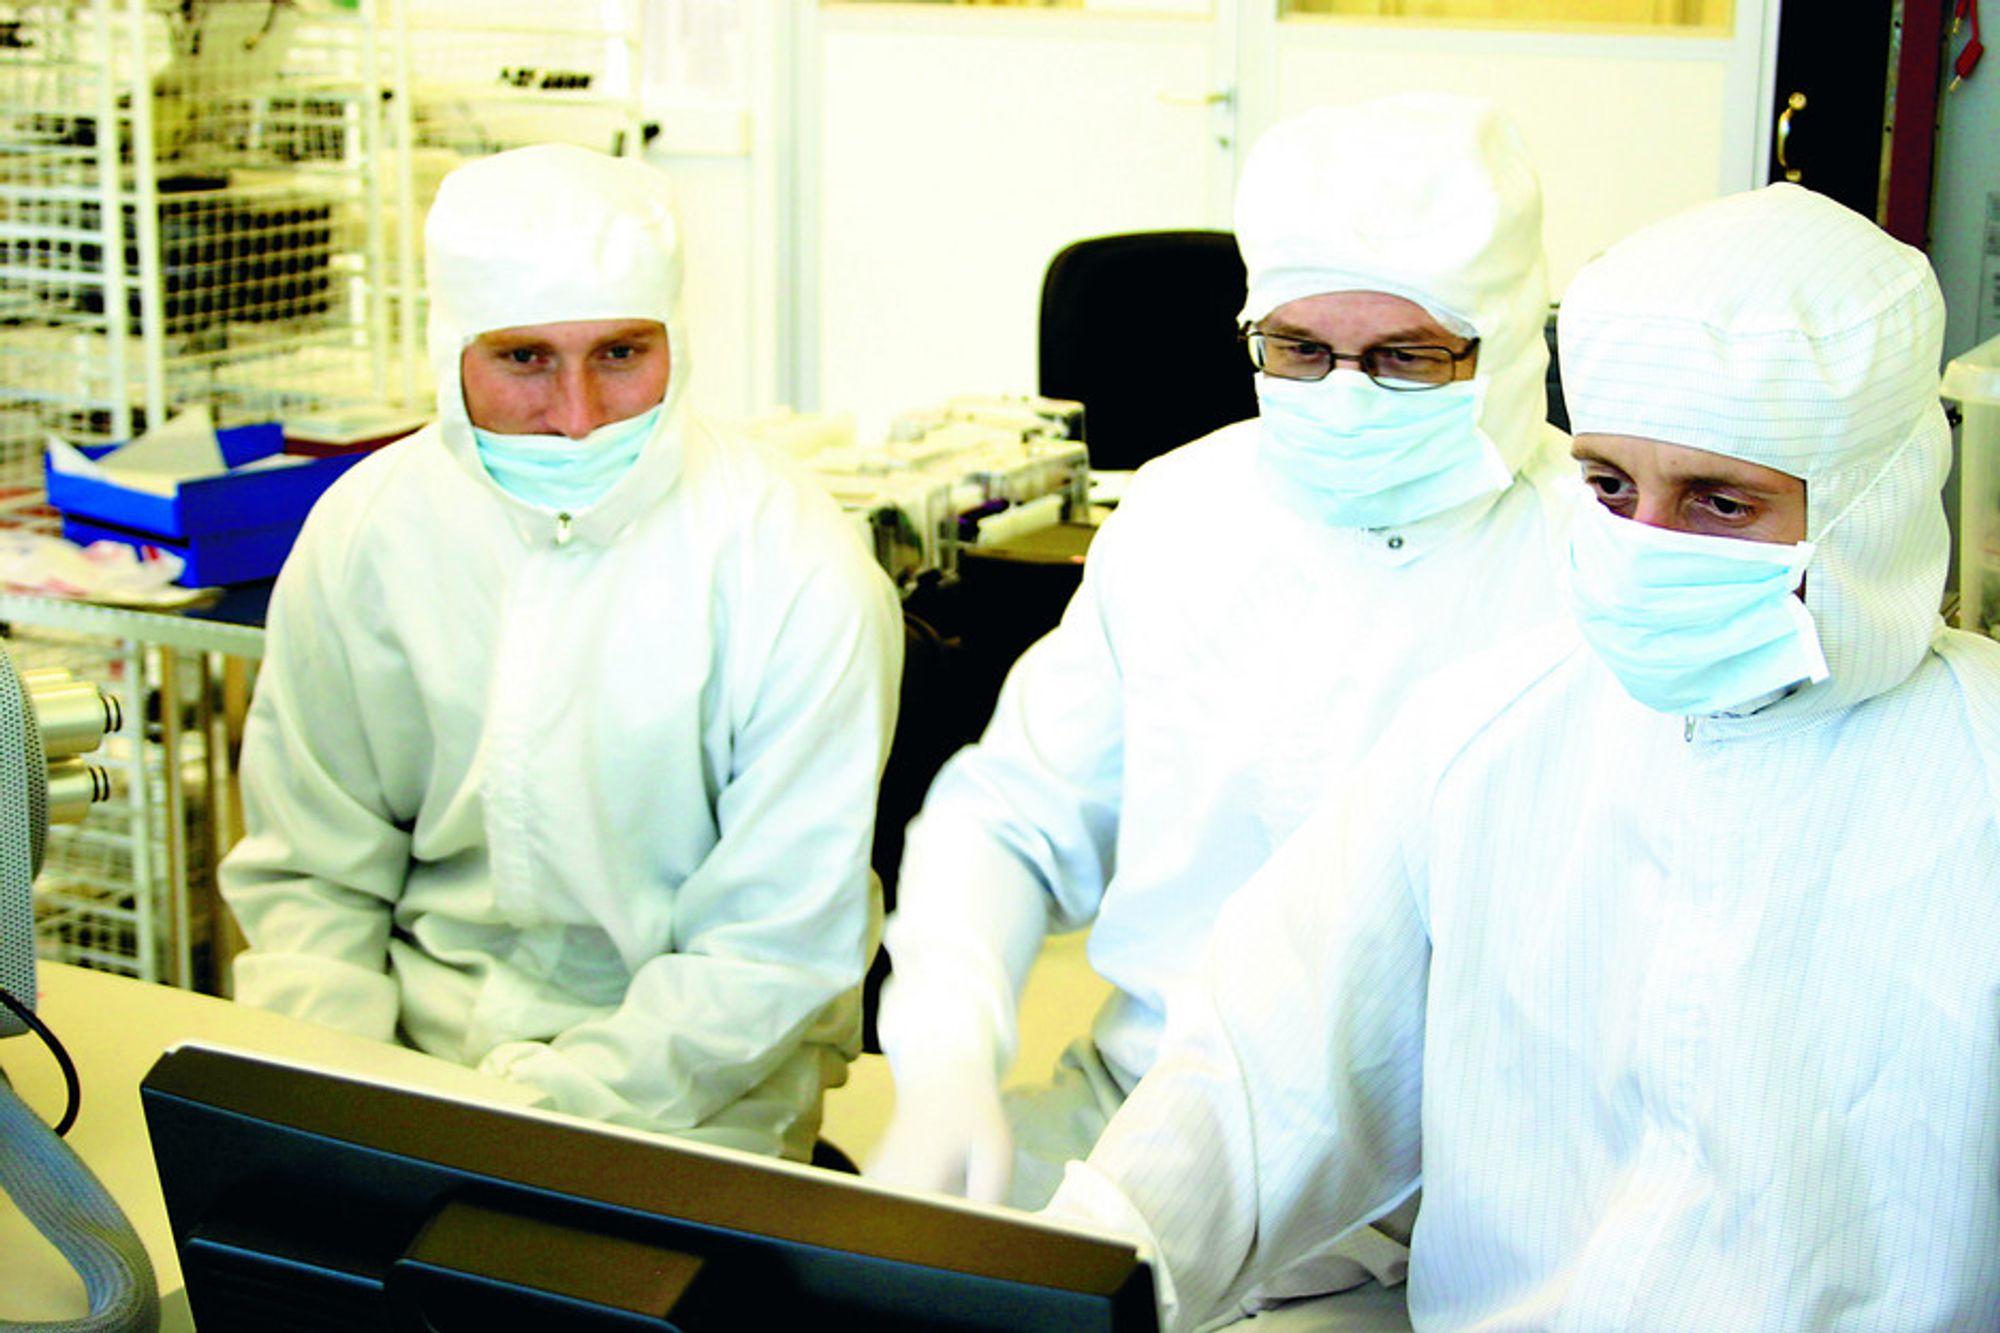 Sintef MiNaLab i Forskningsparken, Oslo. Jon Due Hansen, Trond A. Hansen otg Nicolas Lieater sitter ved laboratoriets elektronmikroskop.